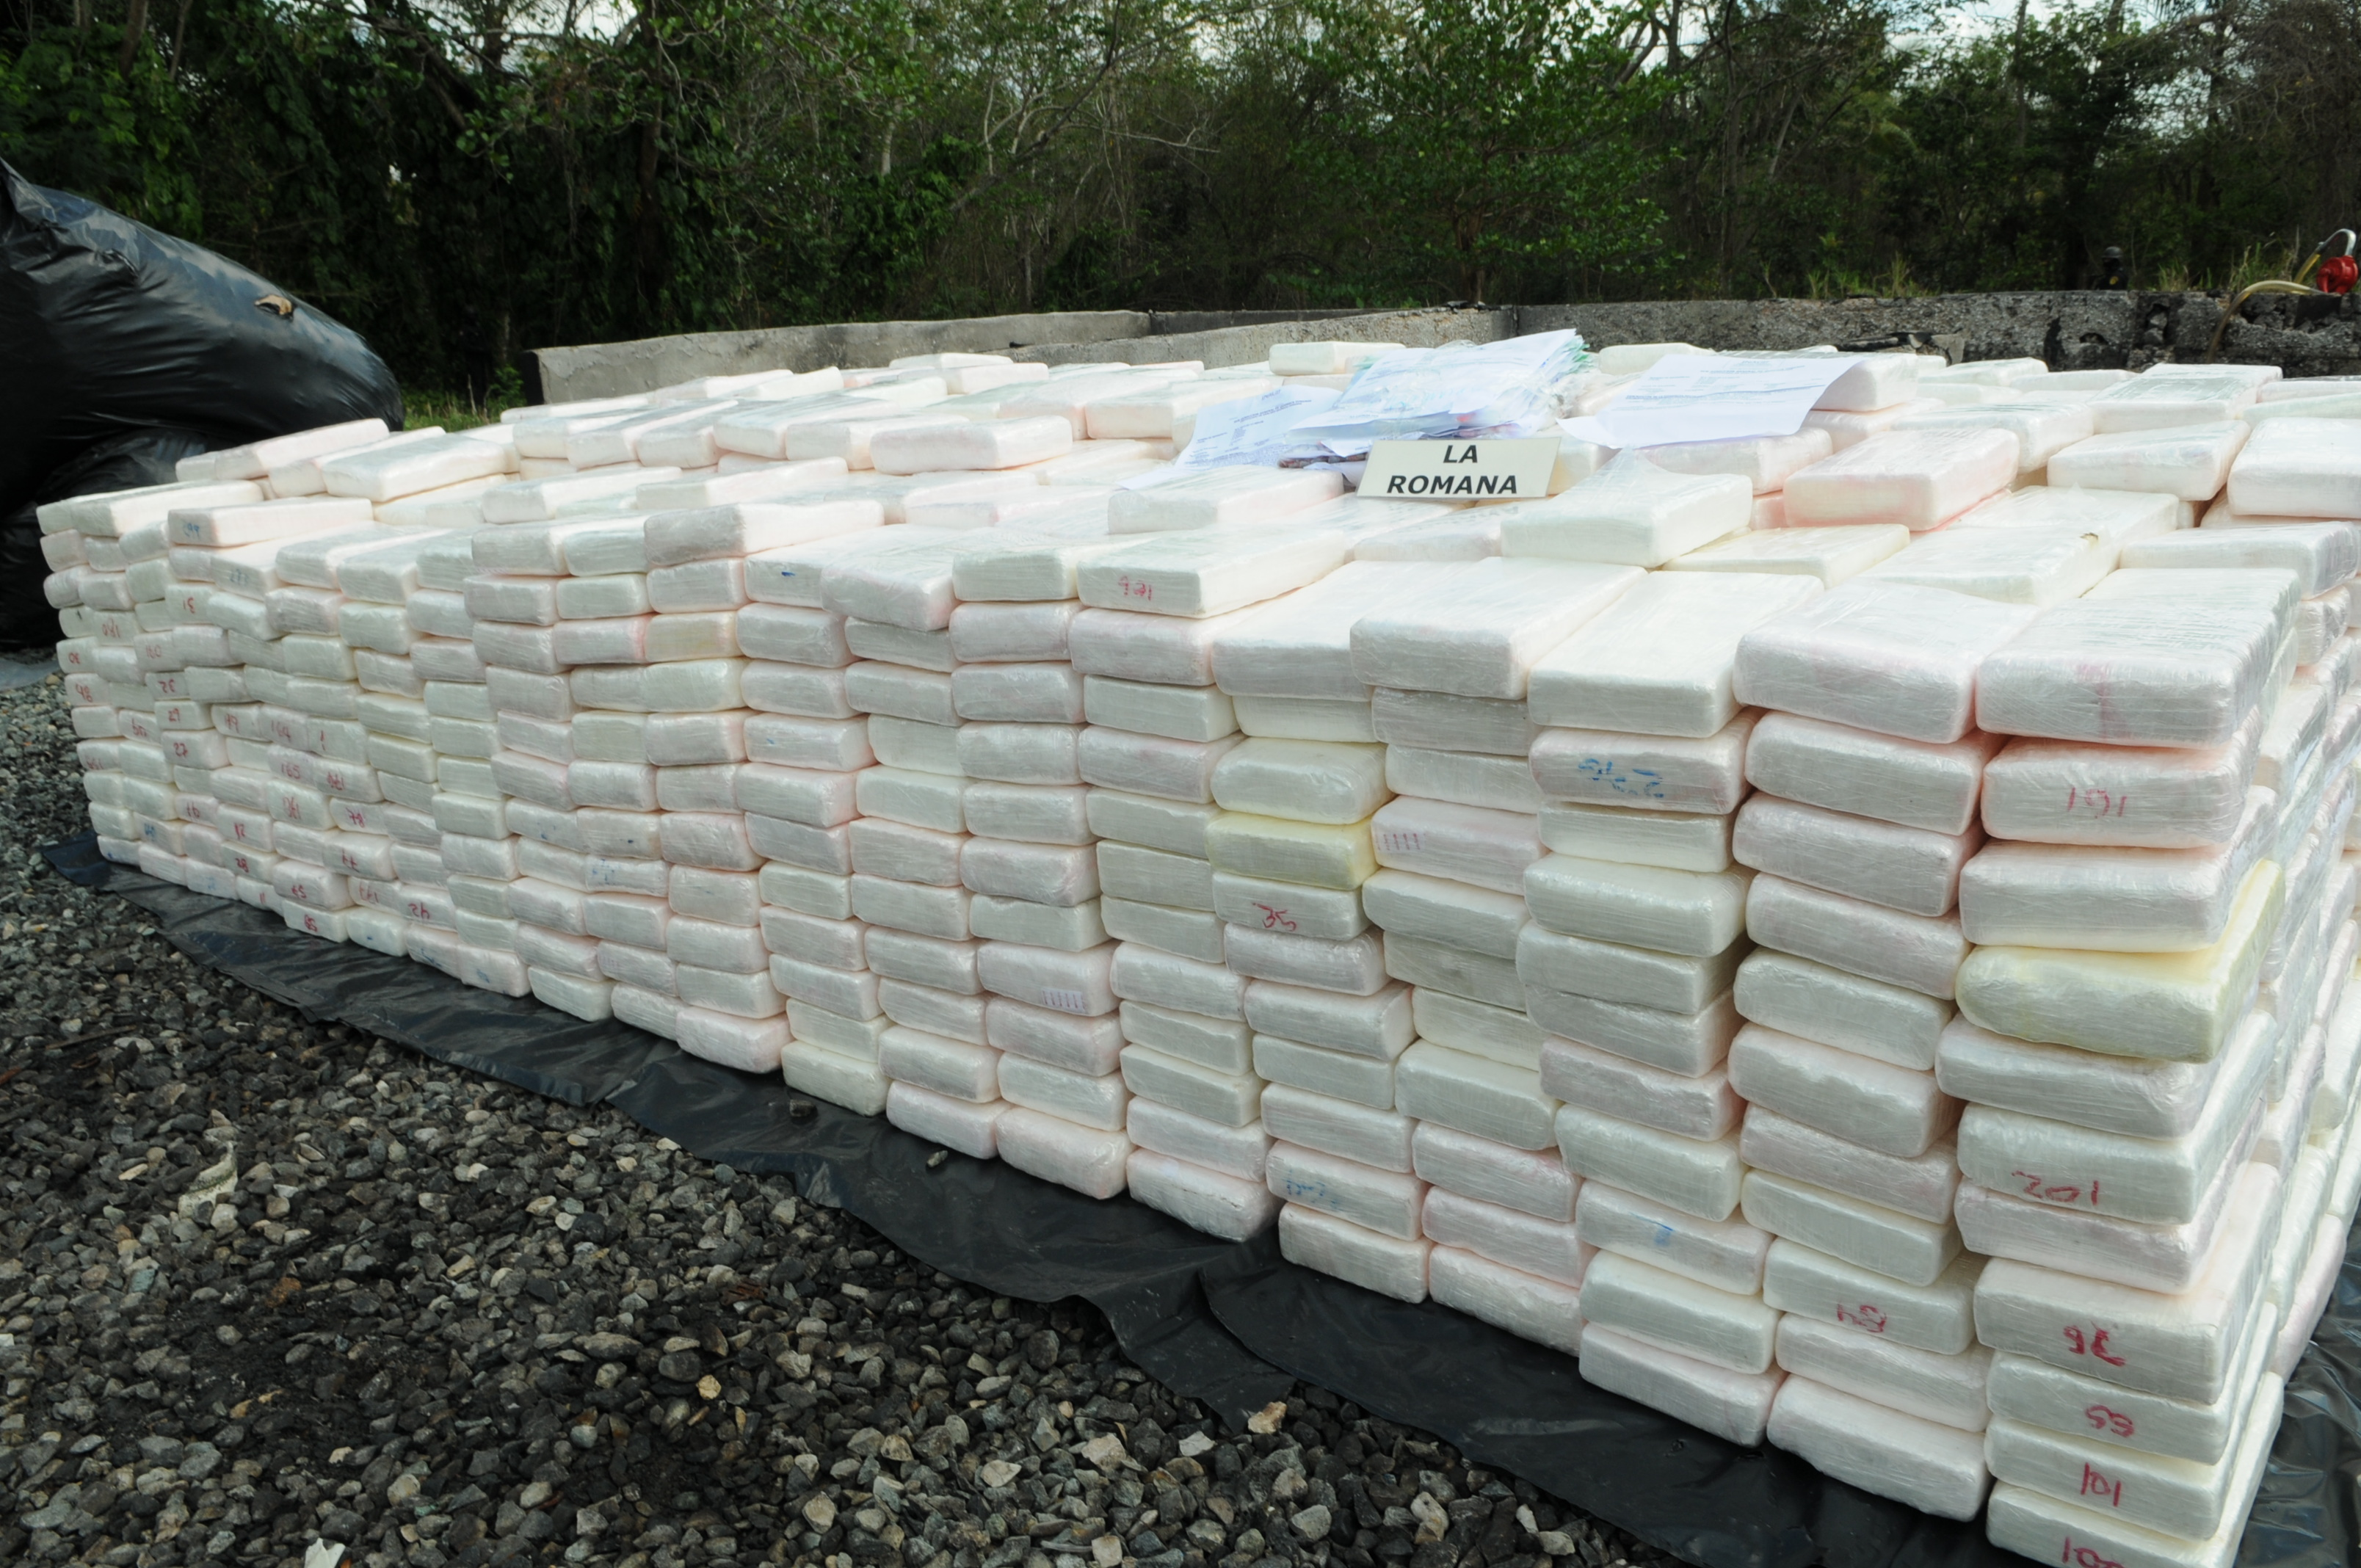 DNCD habría incautado más de 6 toneladas de cocaína en 4 meses